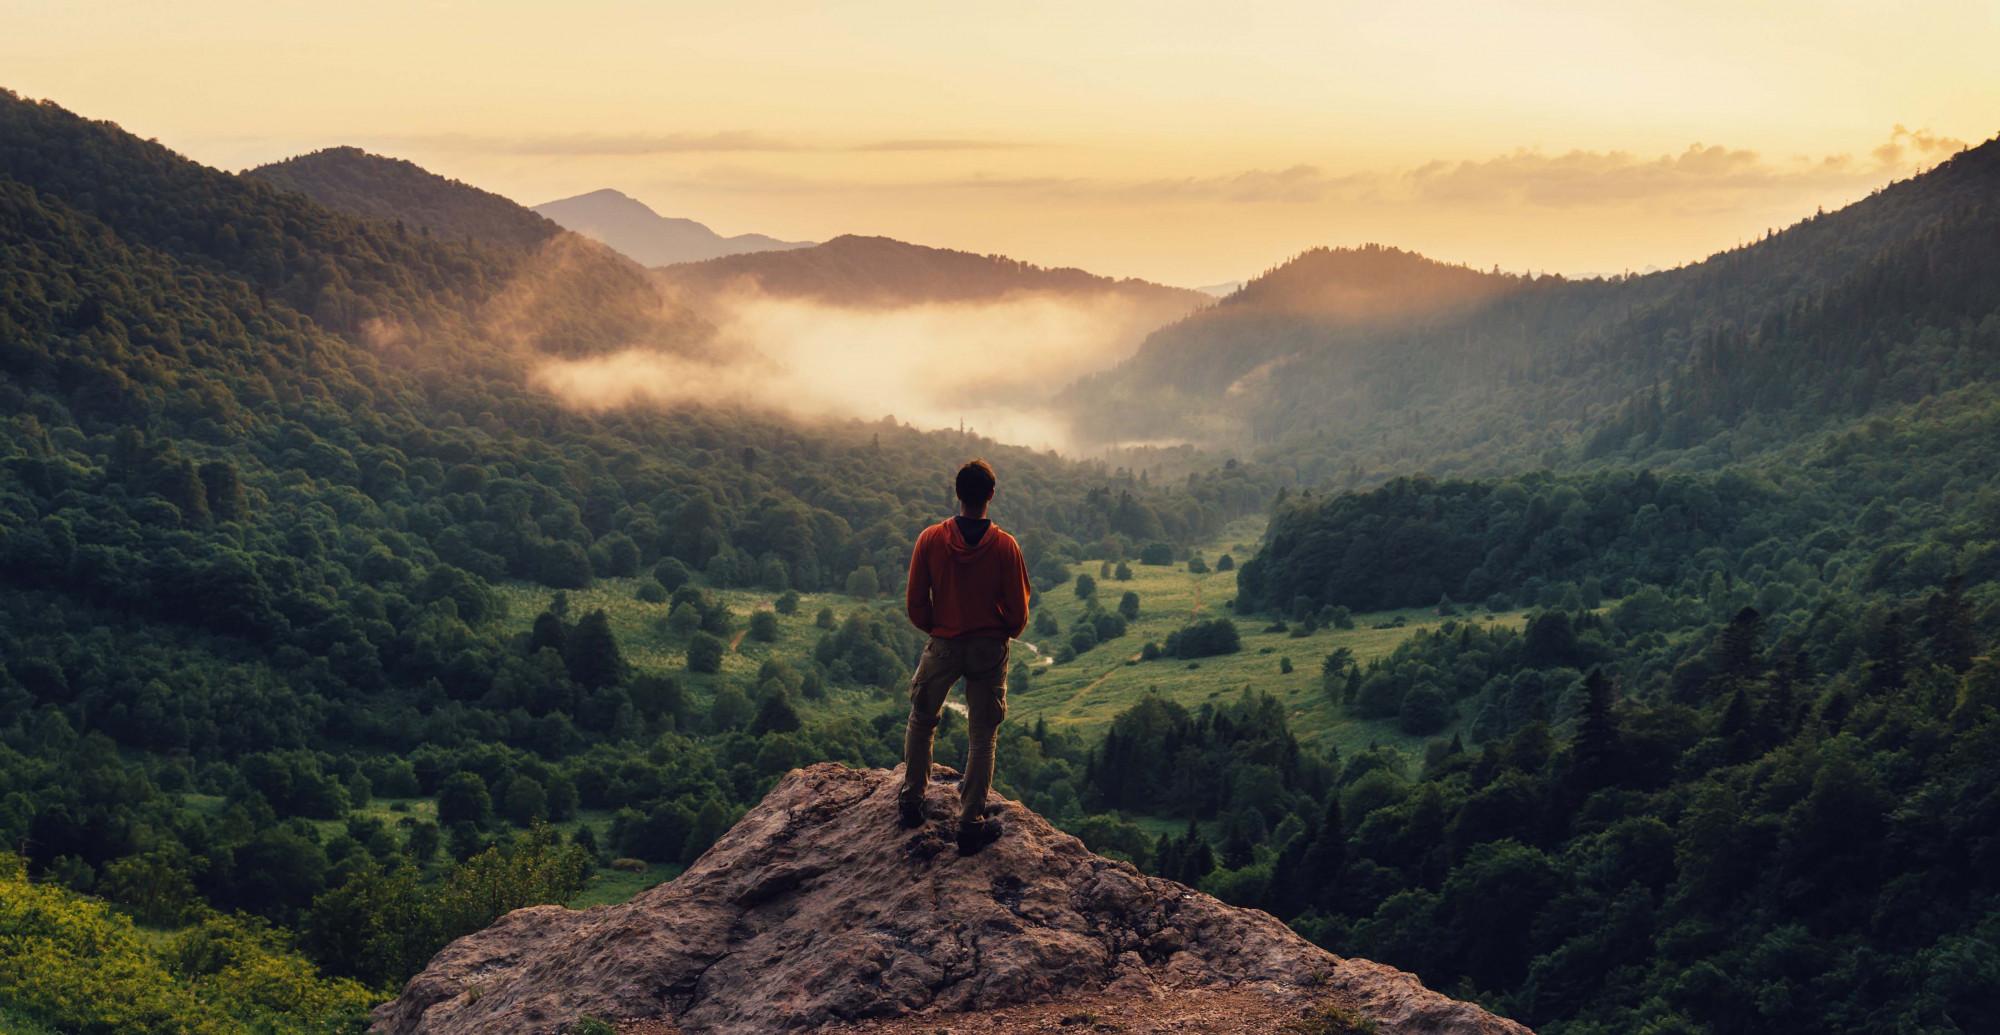 persona-hombre-montaña-vista